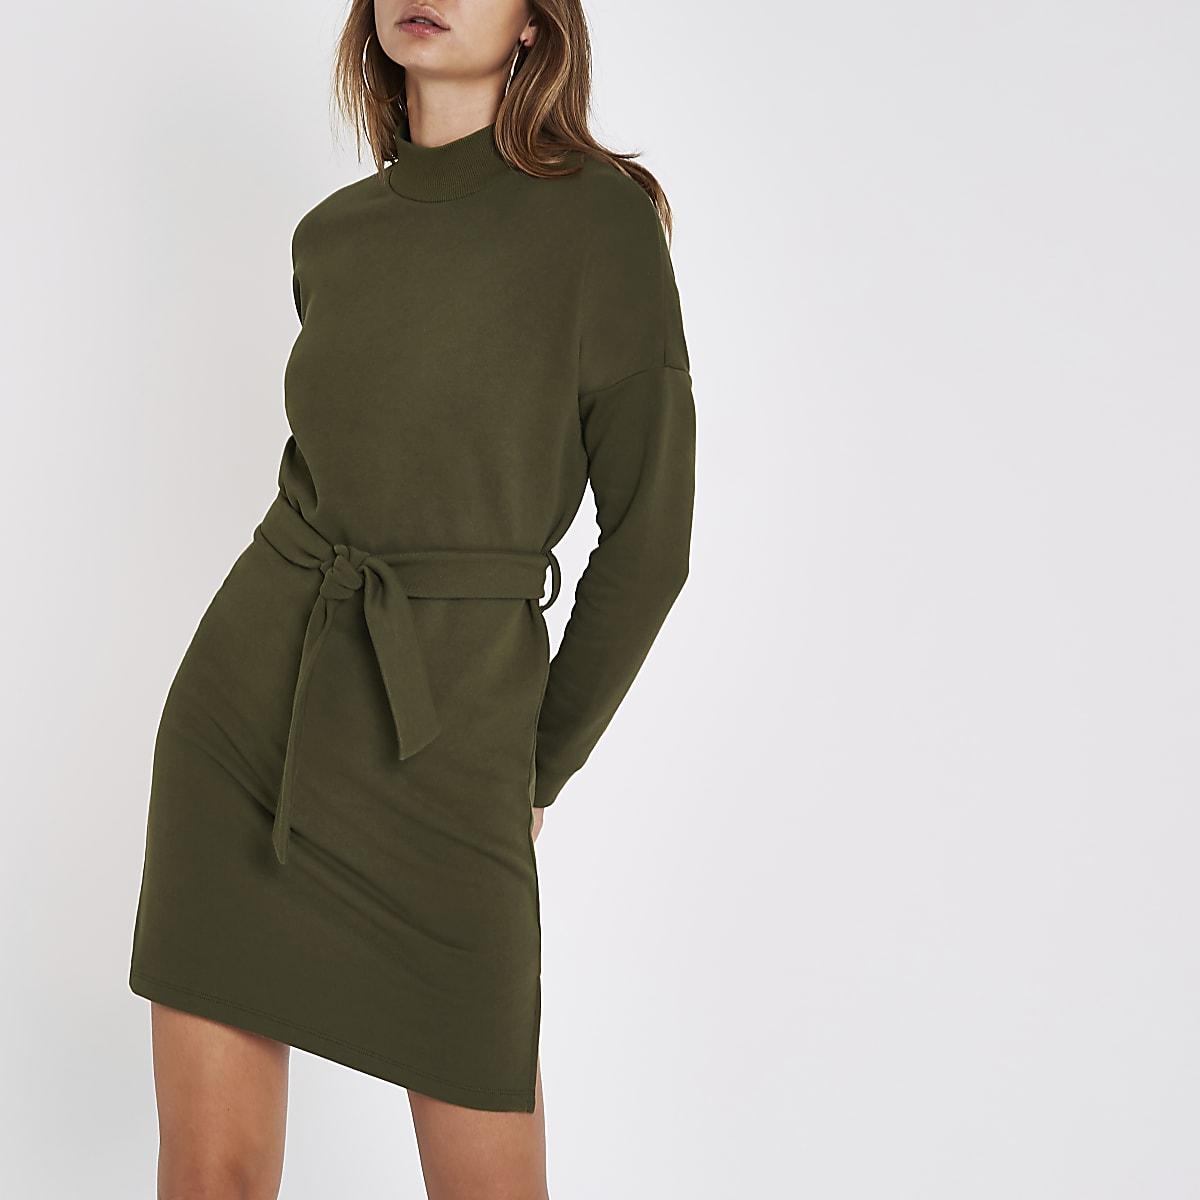 Khaki high neck belted jumper dress